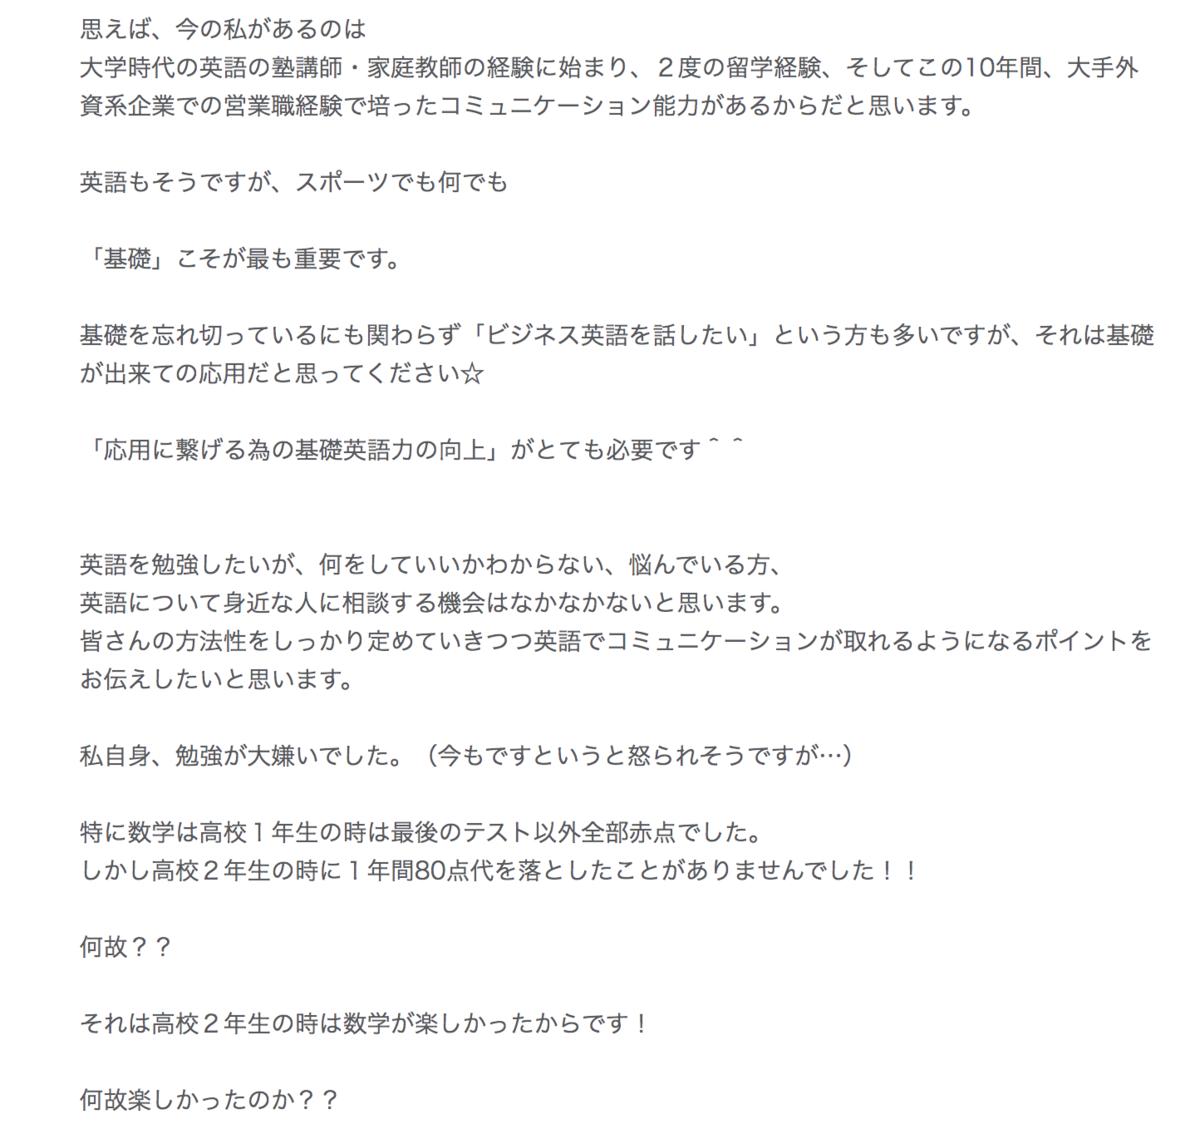 f:id:ricowaki_st:20200122210448p:plain